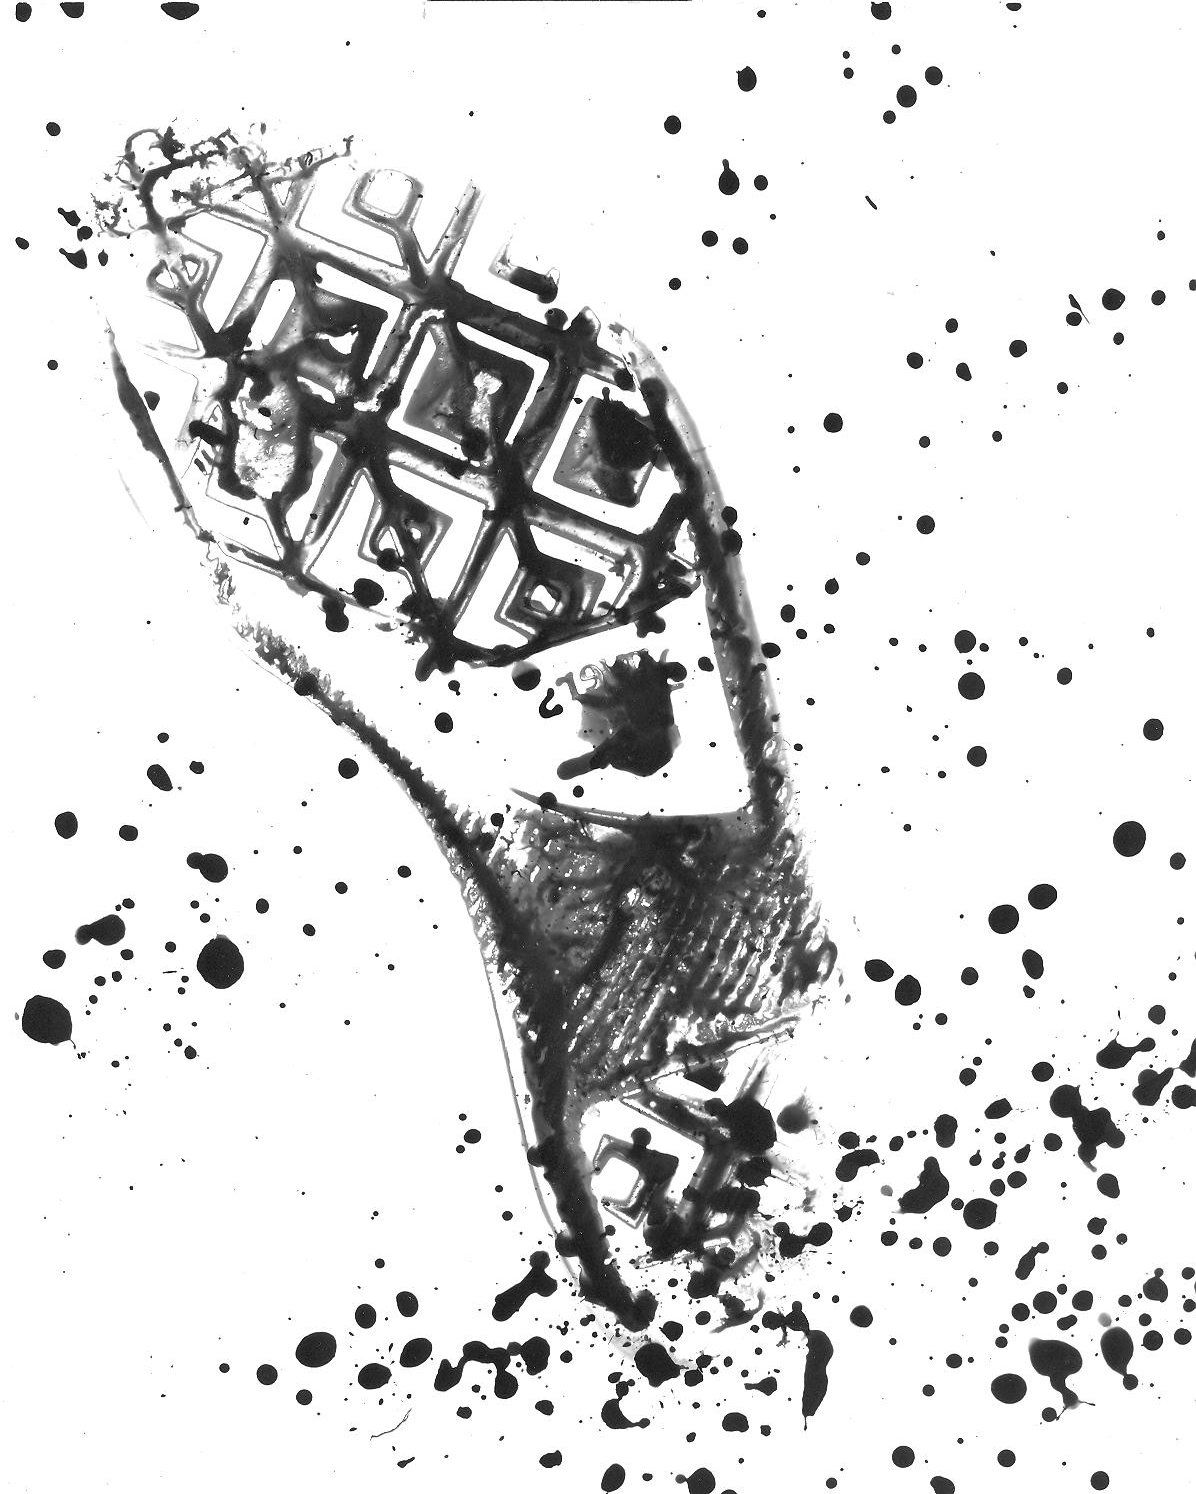 Travel Shoeprint Converse Splatter Black White